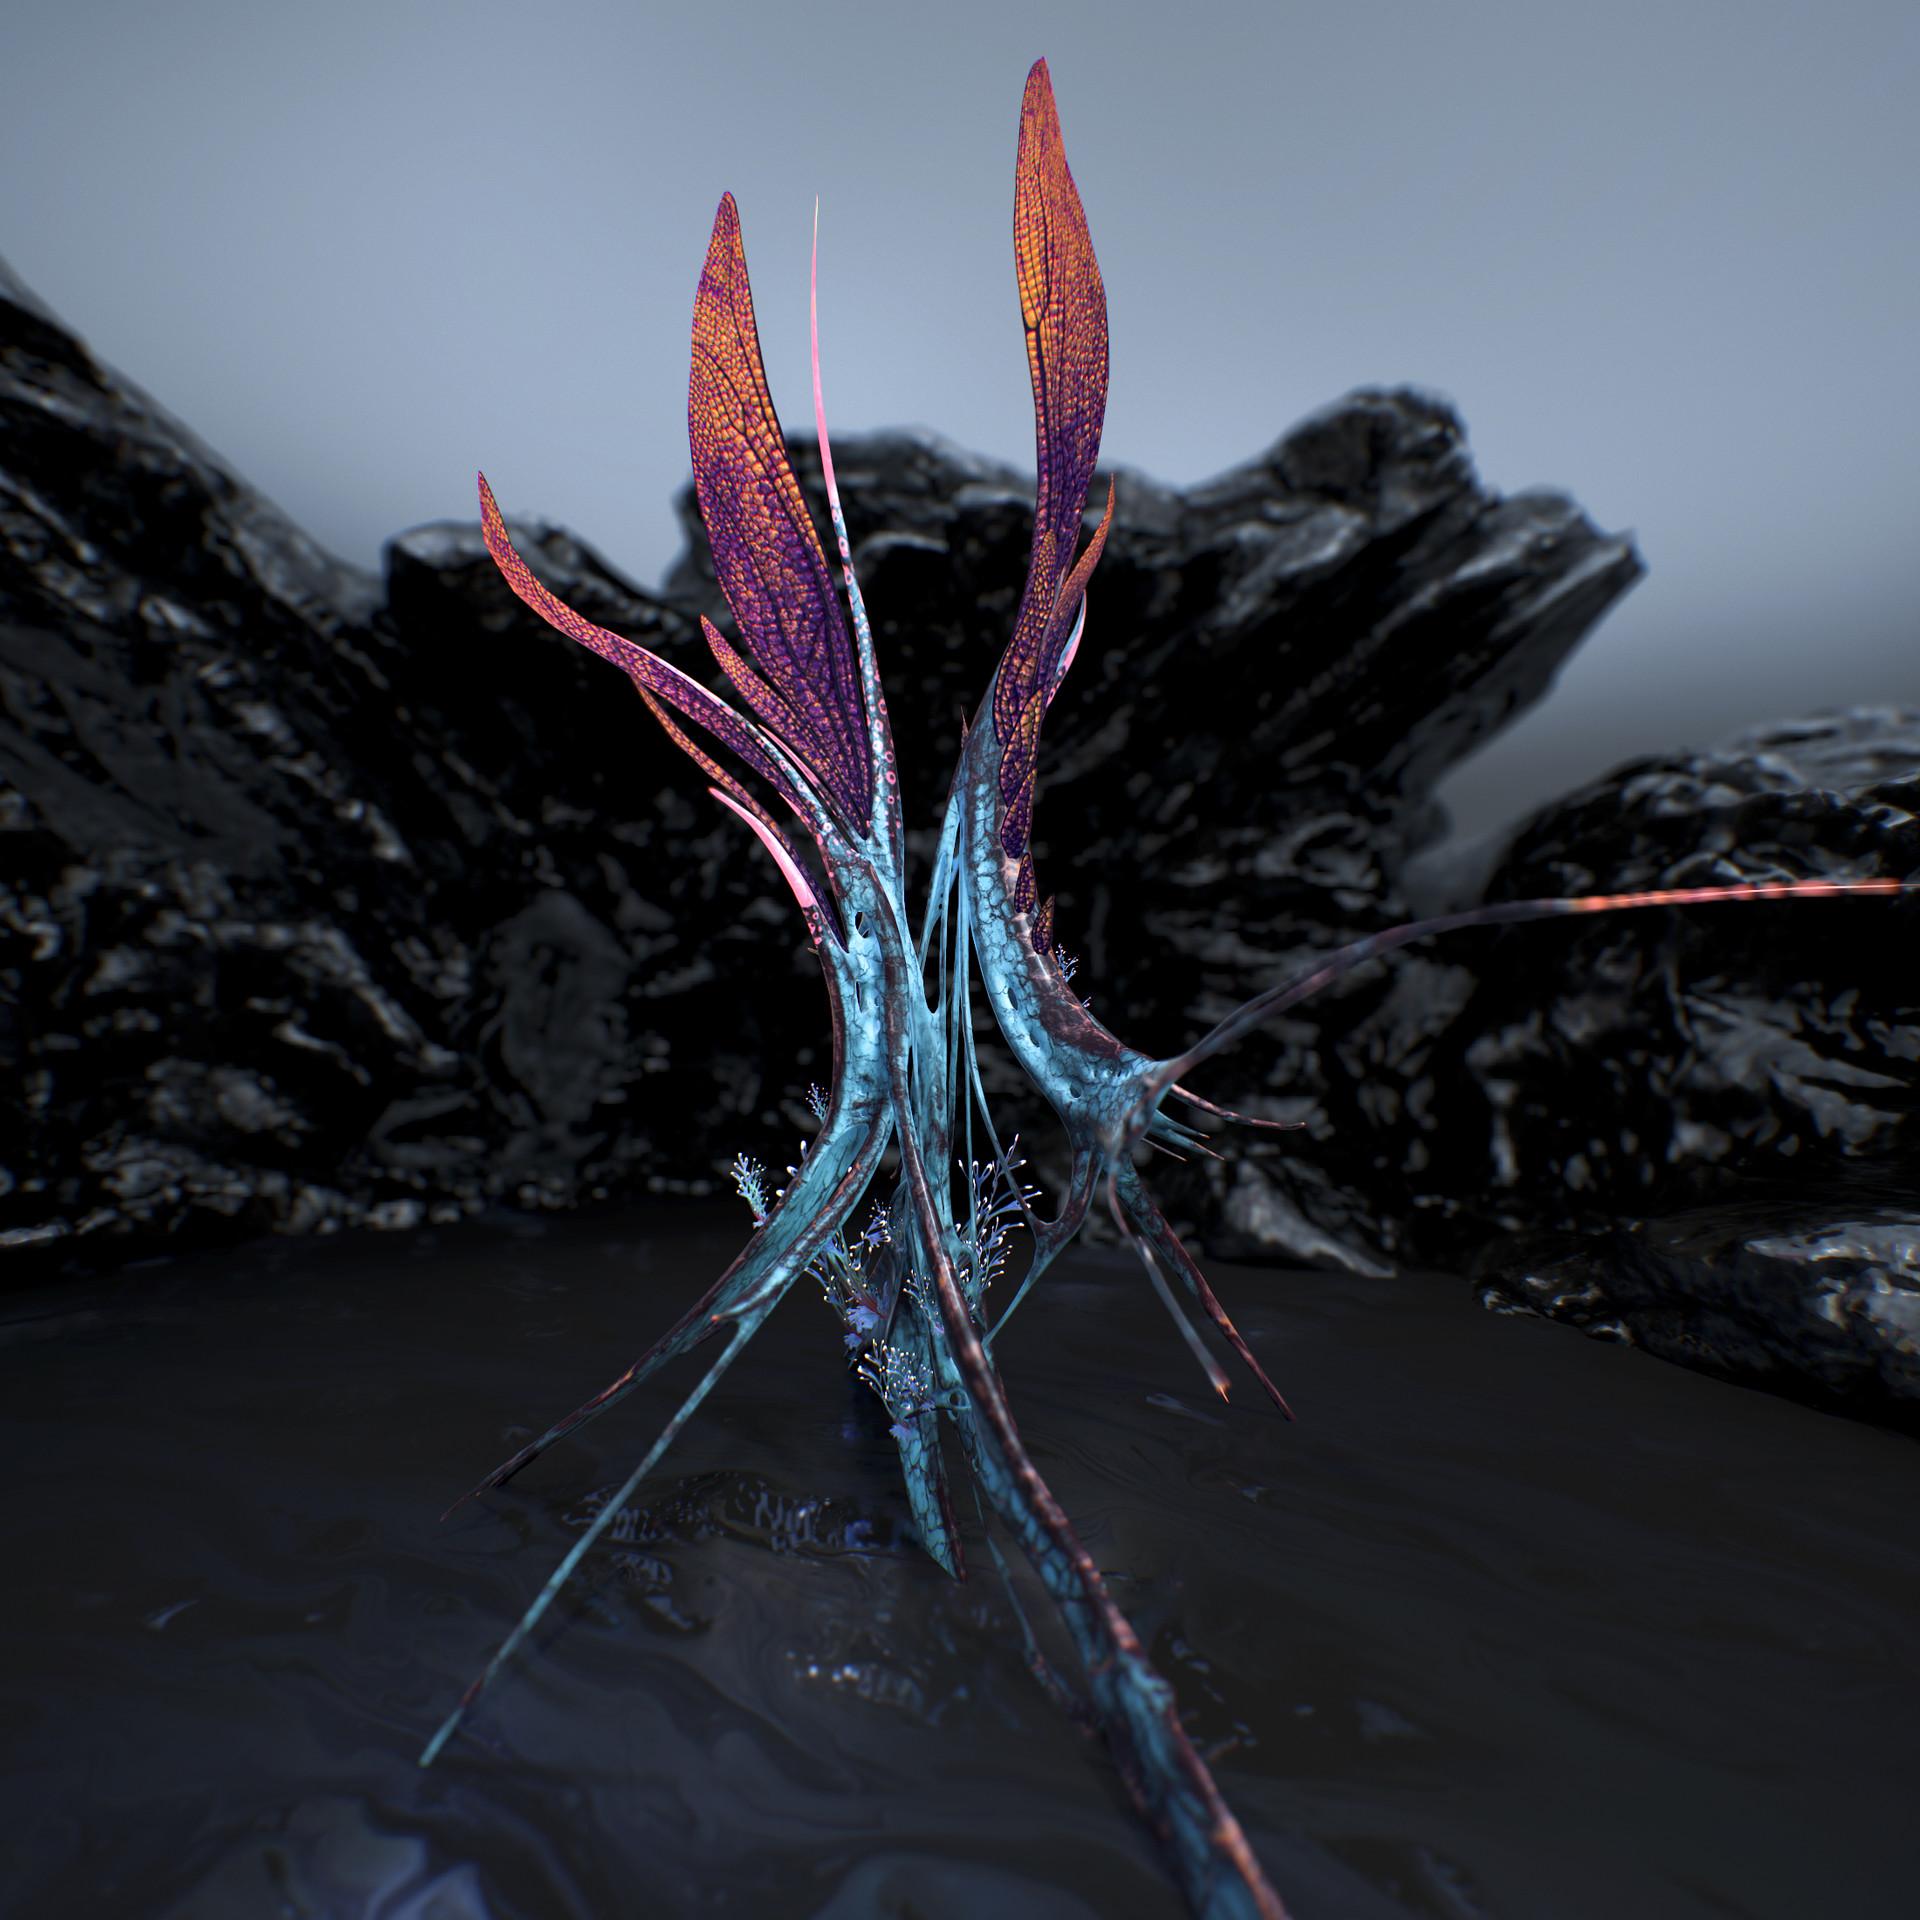 Johan de leenheer alien fern misota spletinus55